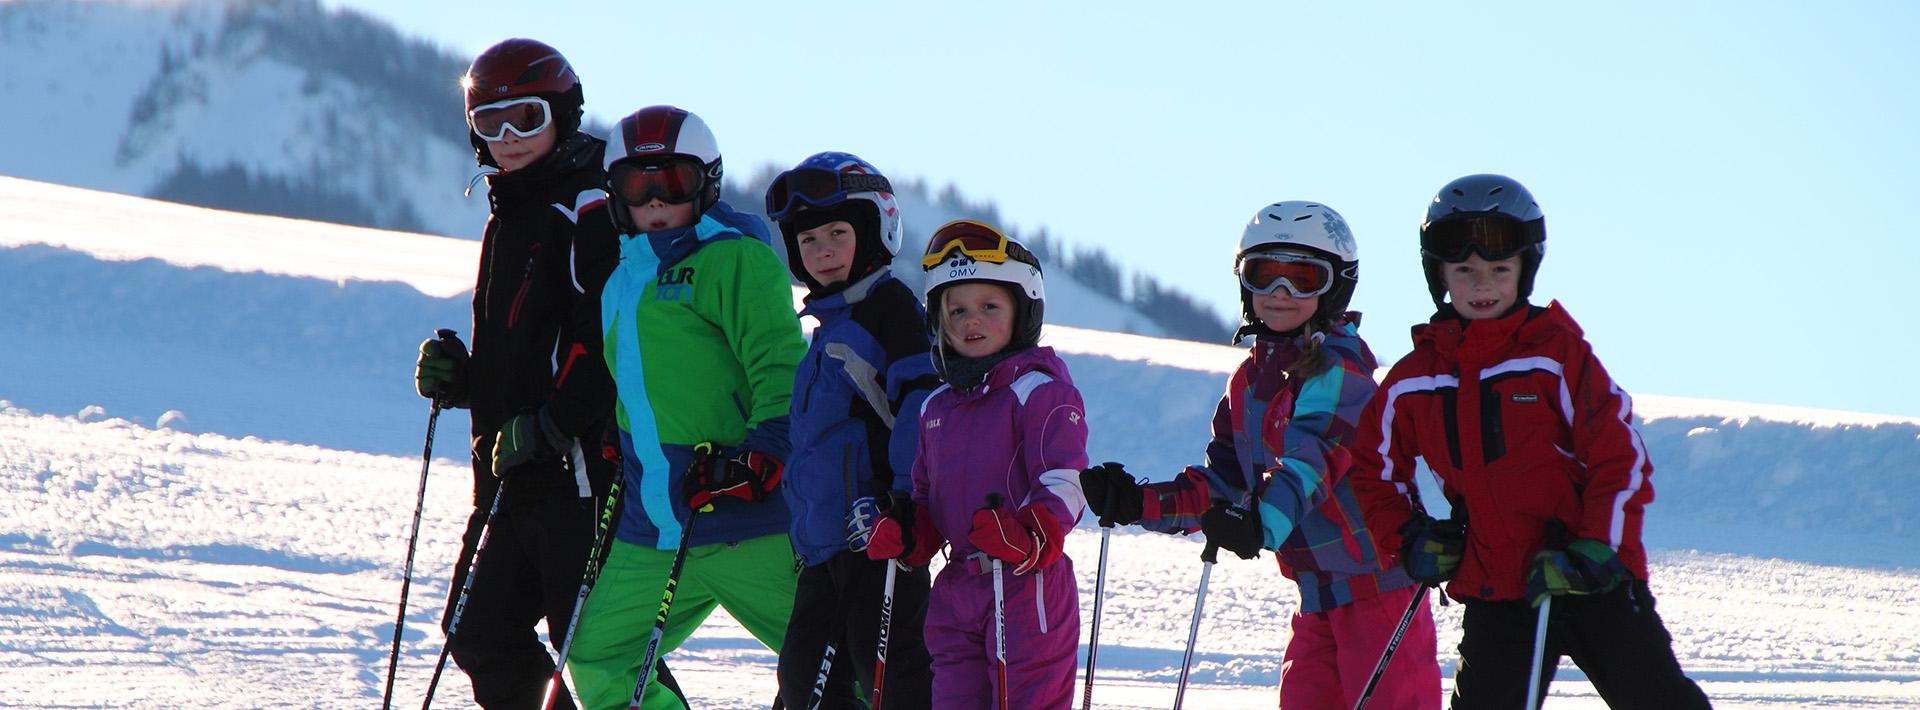 Kinder beim Skifahren am Königsberg